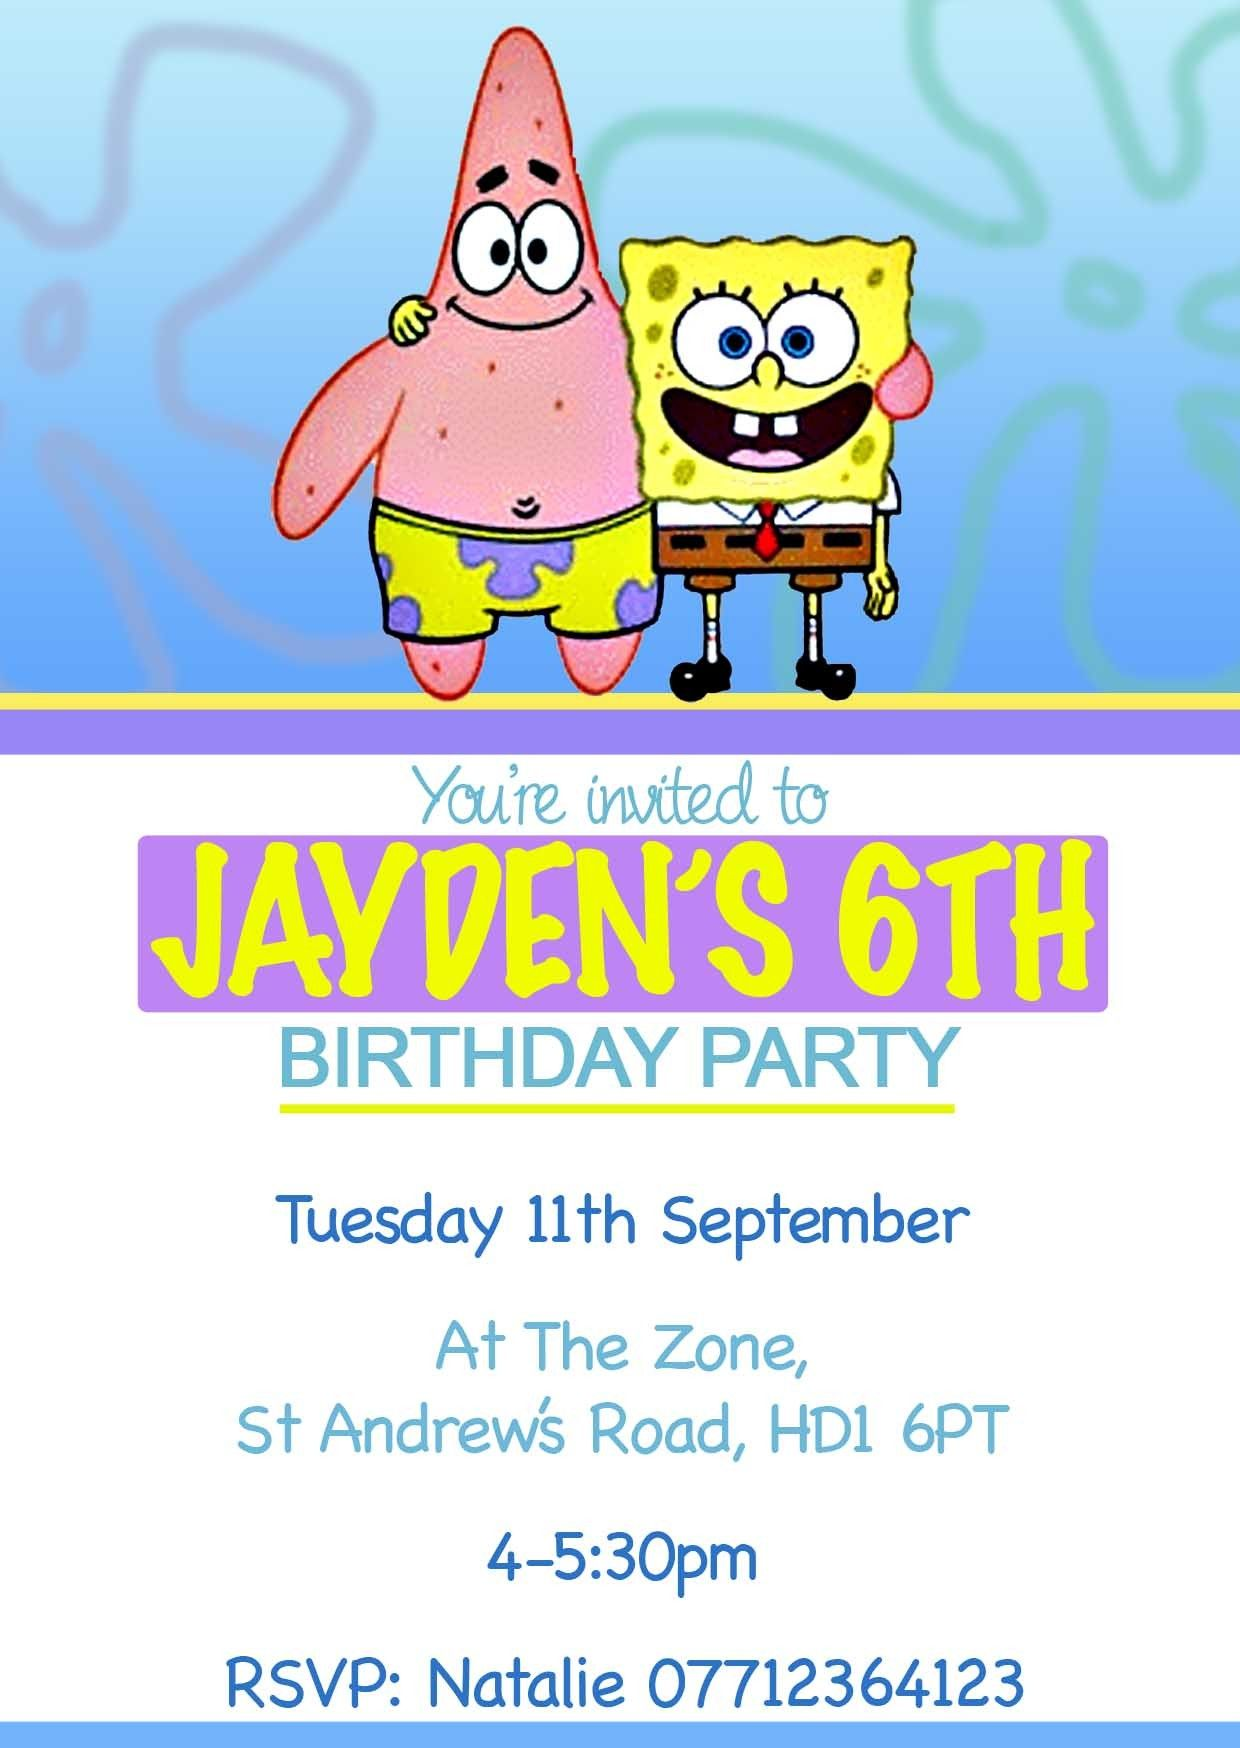 10 Personalised Spongebob Patrick Birthday Party Invitations 5 00